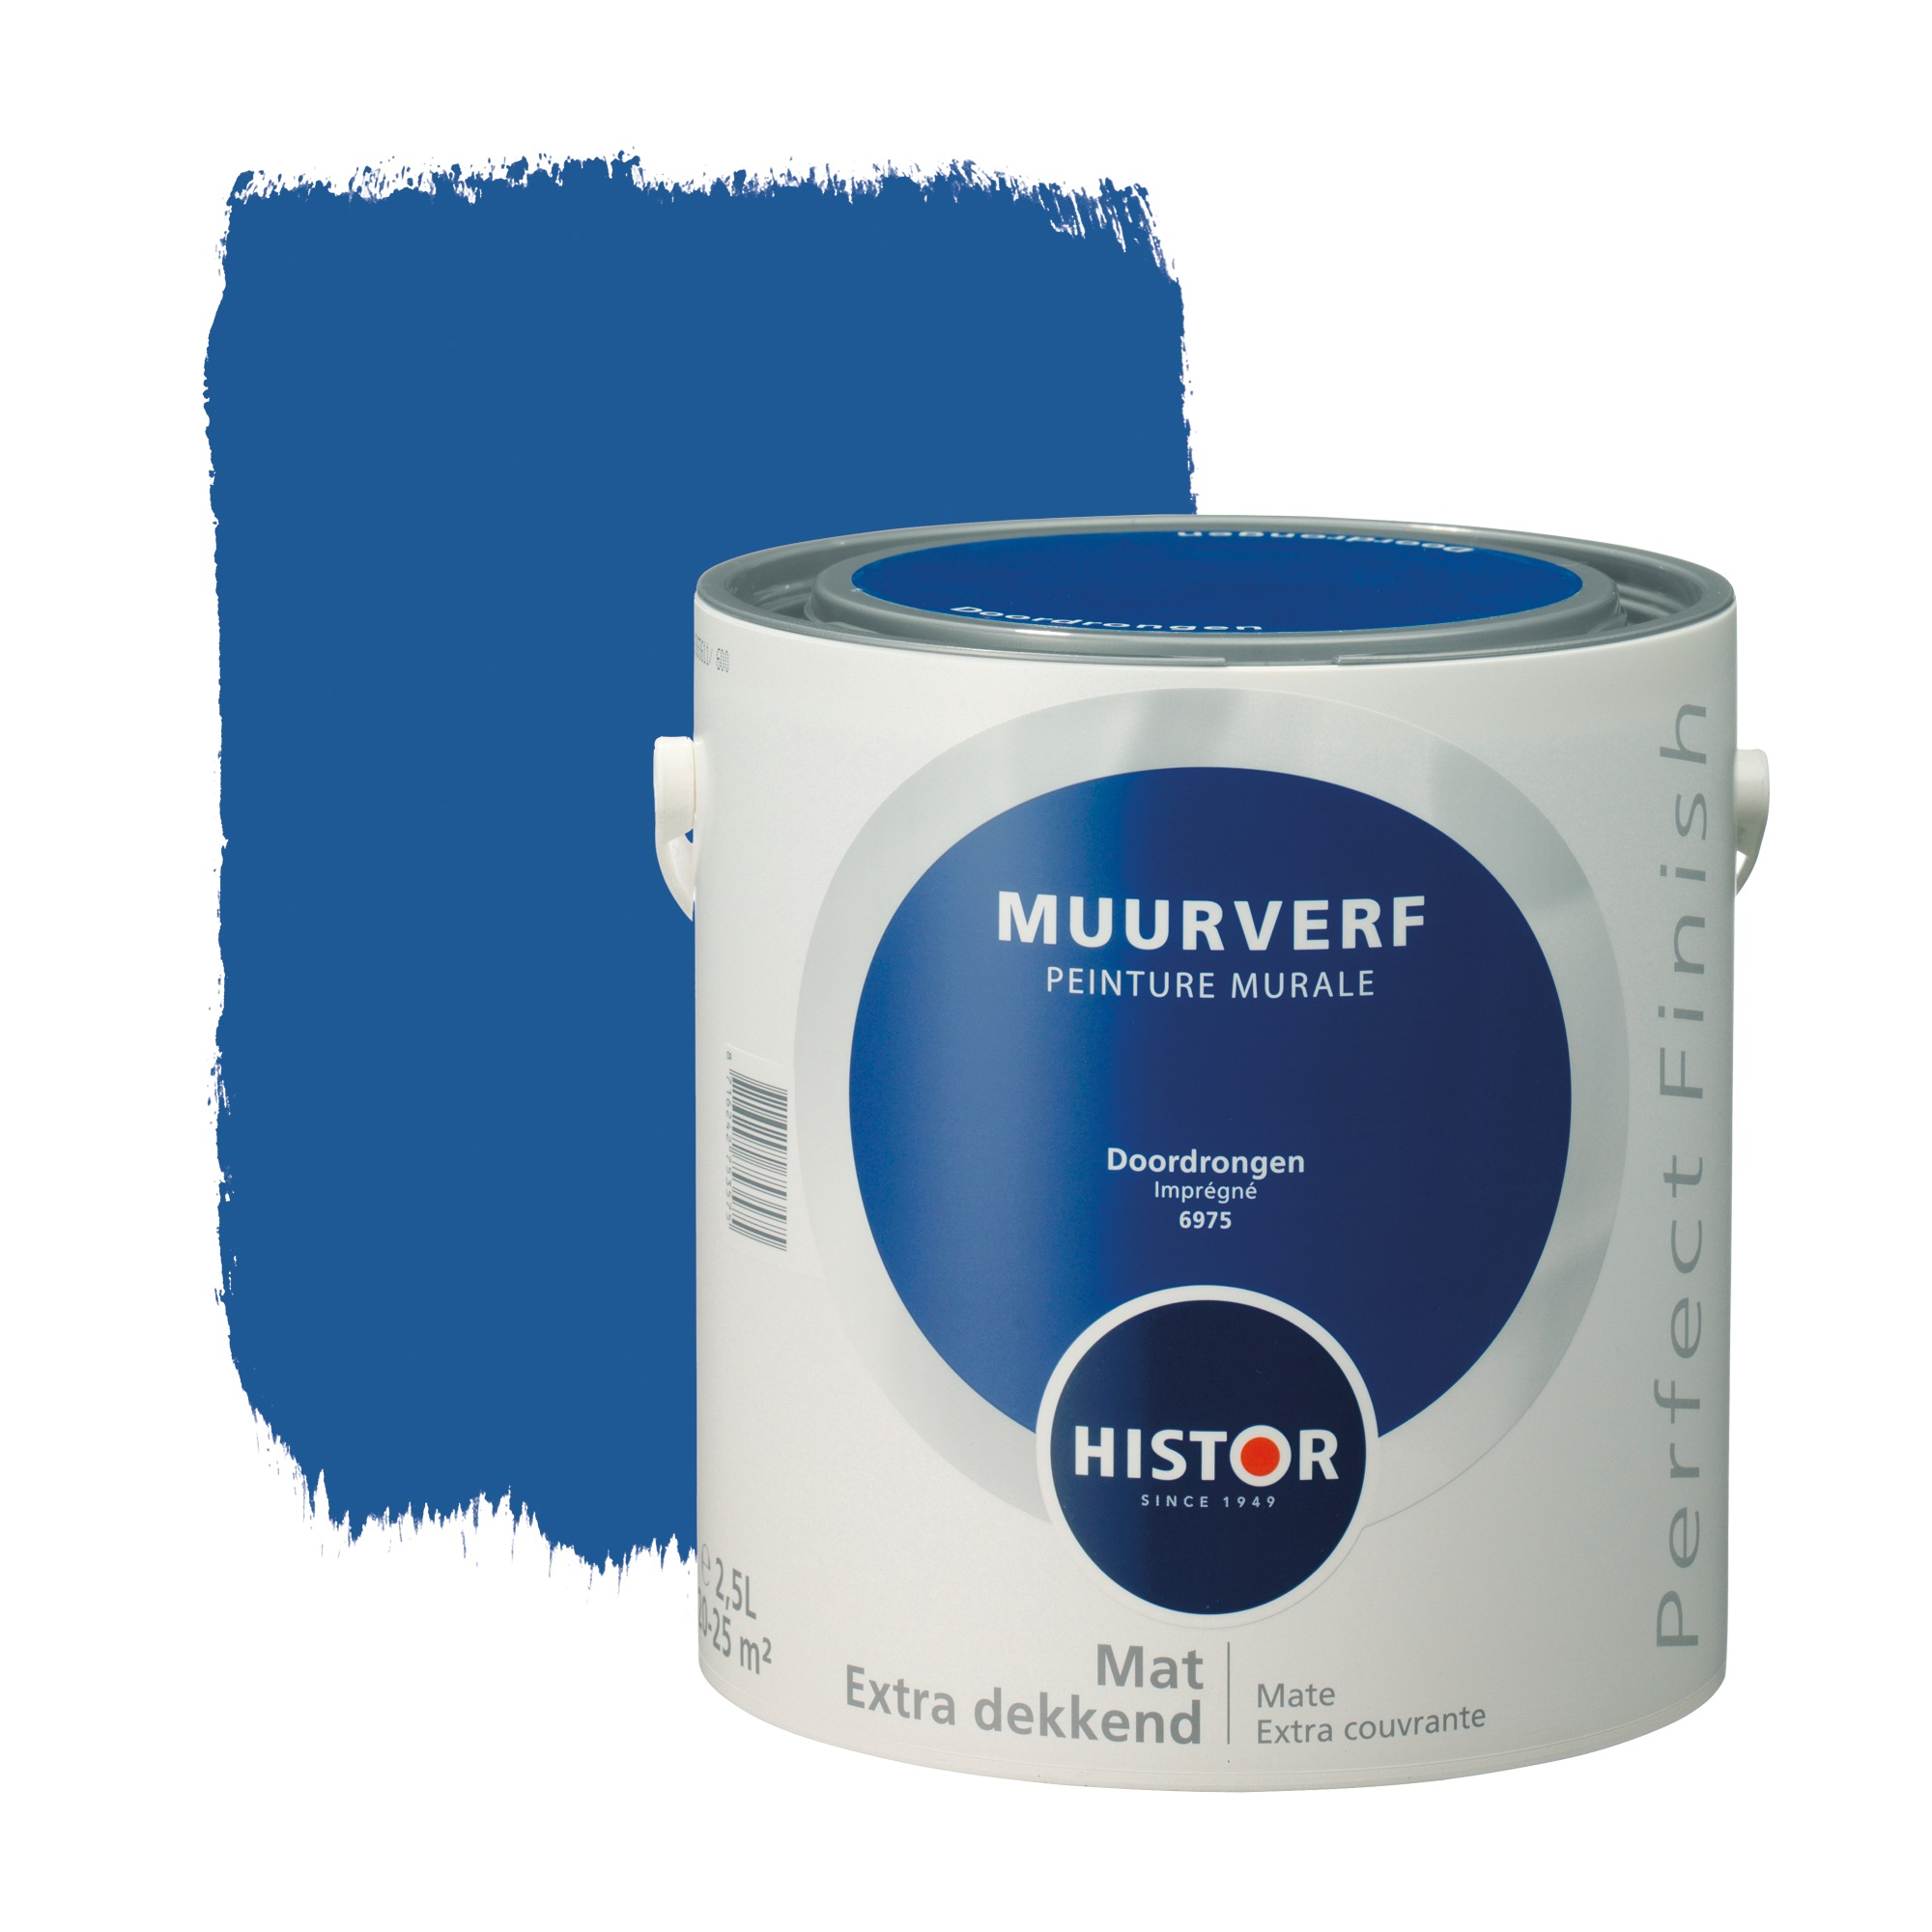 Histor perfect finish muurverf mat doordrongen 6975 2,5 l